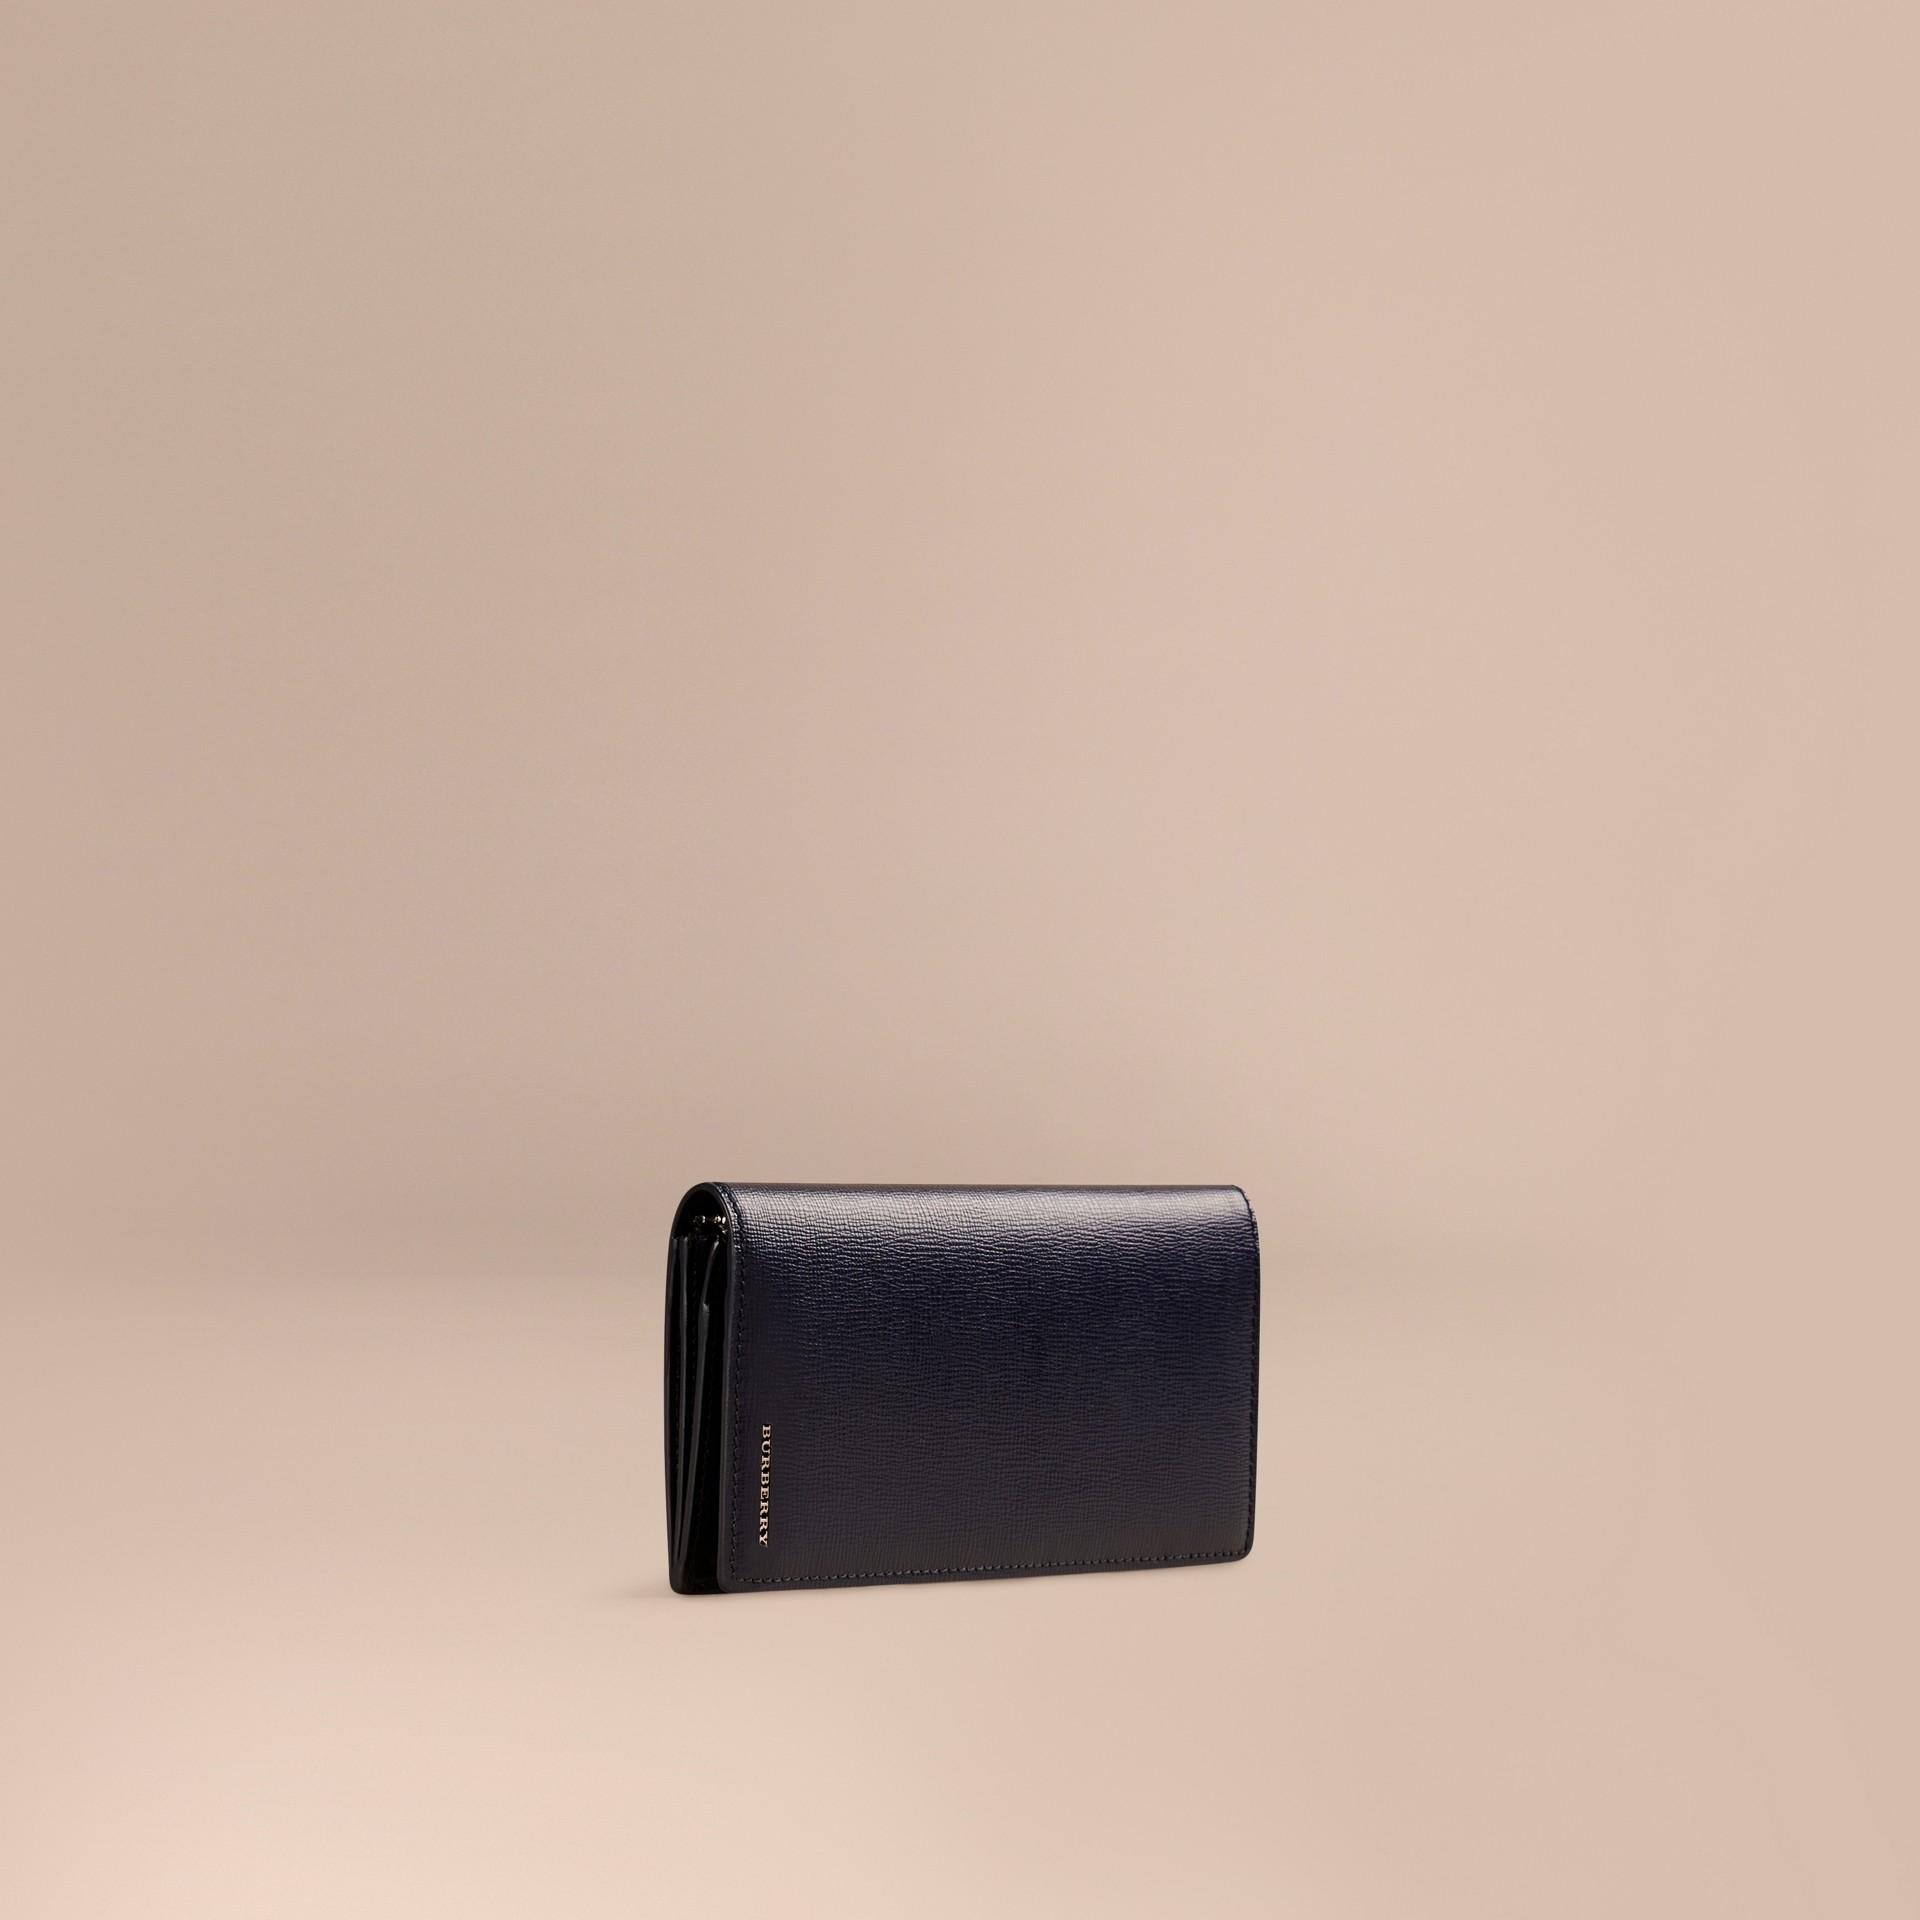 Dark navy London Leather Continental Wallet Dark Navy - gallery image 1